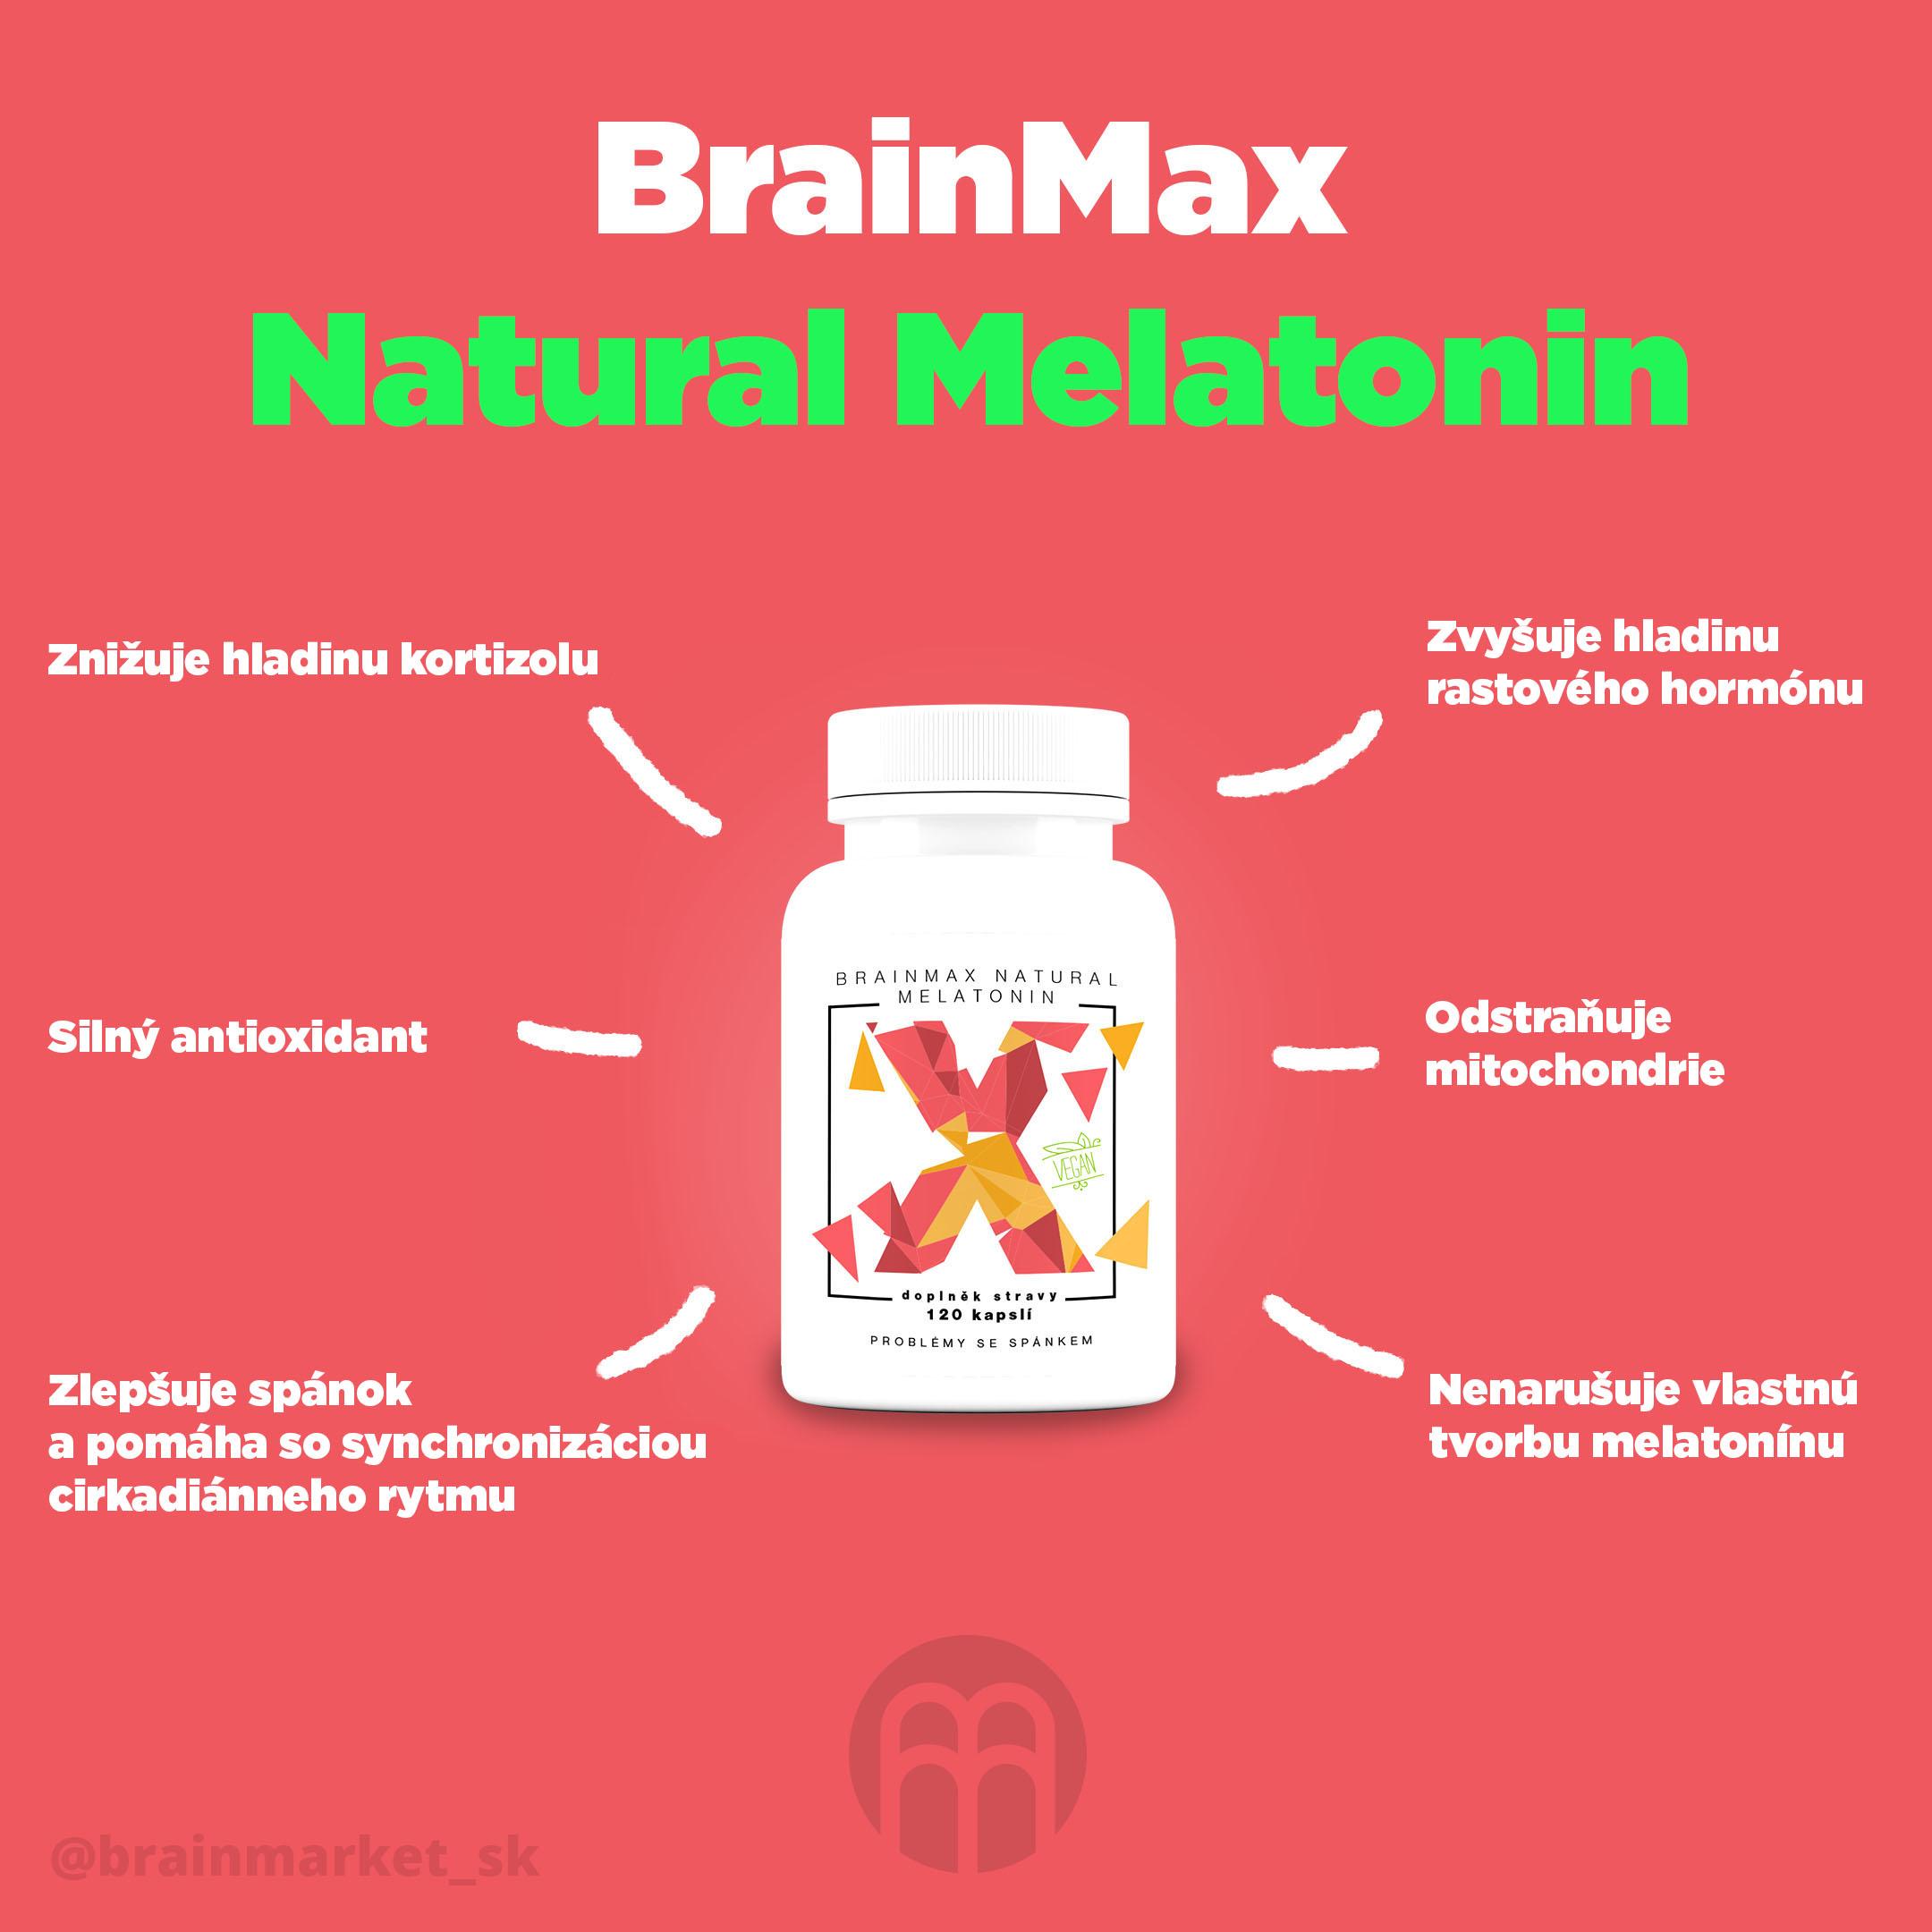 brainmax_melatonin_SK_Infografika_Instagram_BrainMarket